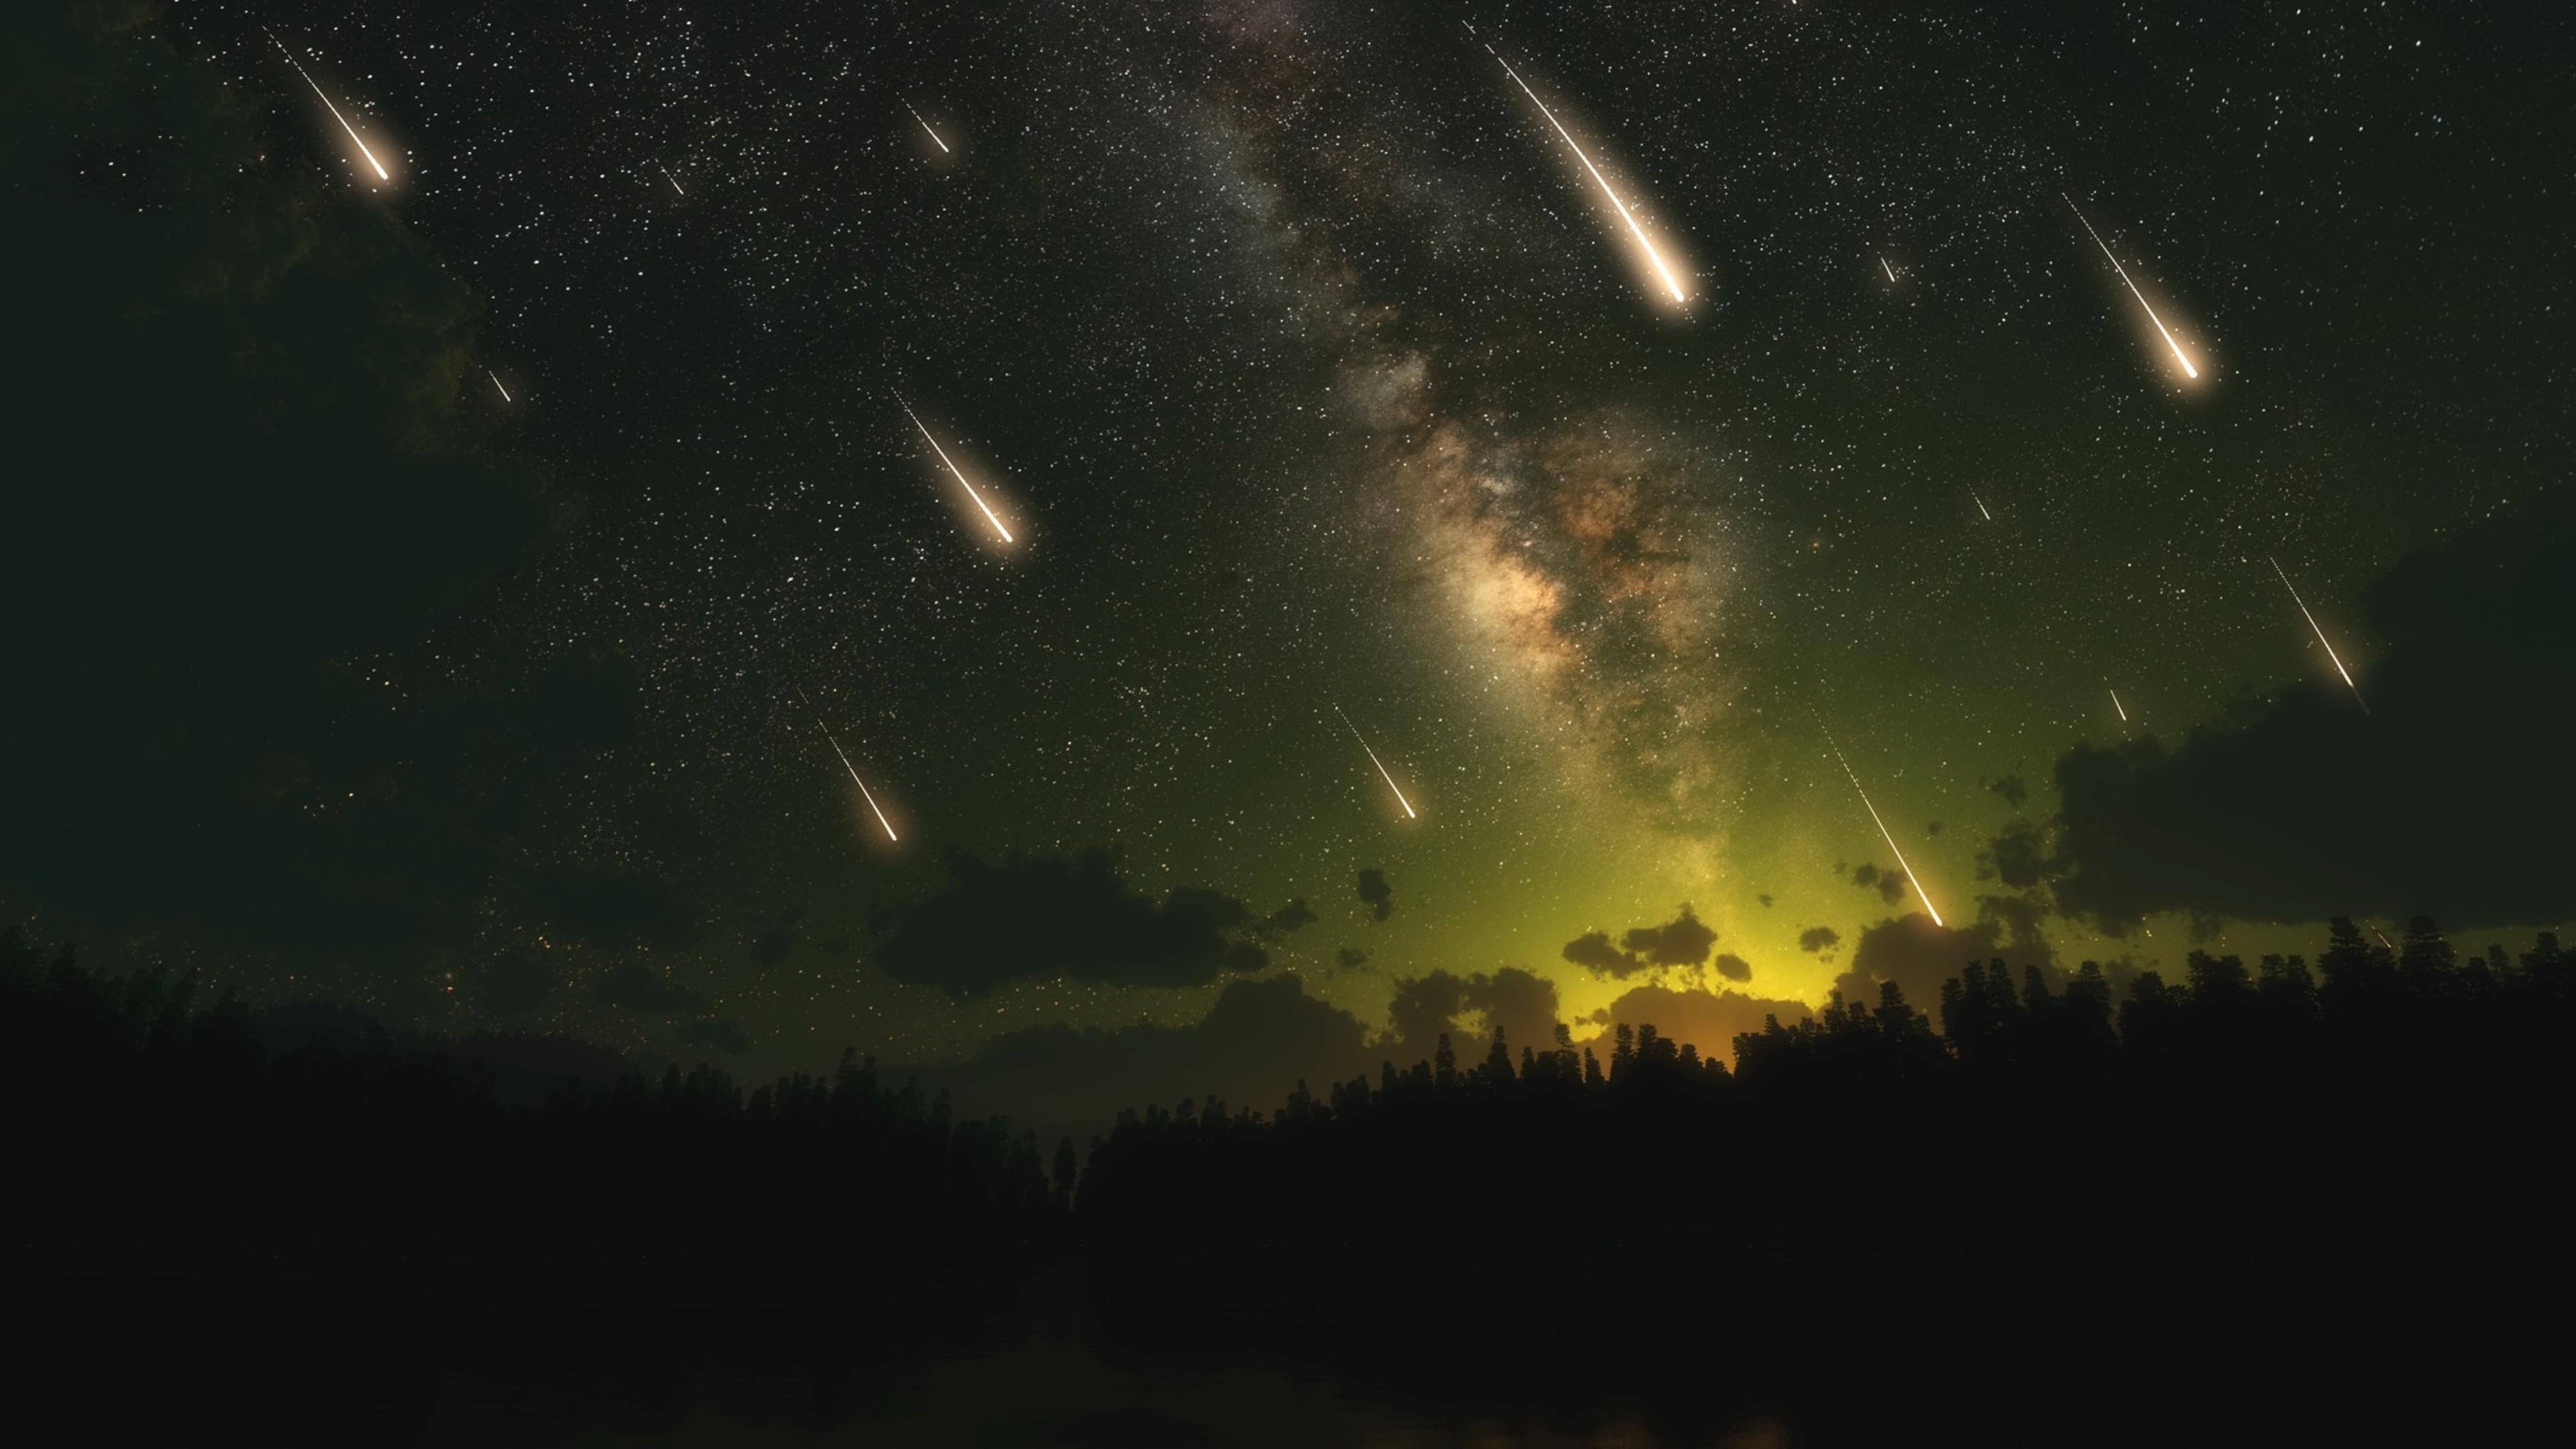 meteors dark night 4k 1546278809 - Meteors Dark Night 4k - night wallpapers, meteors wallpapers, dark wallpapers